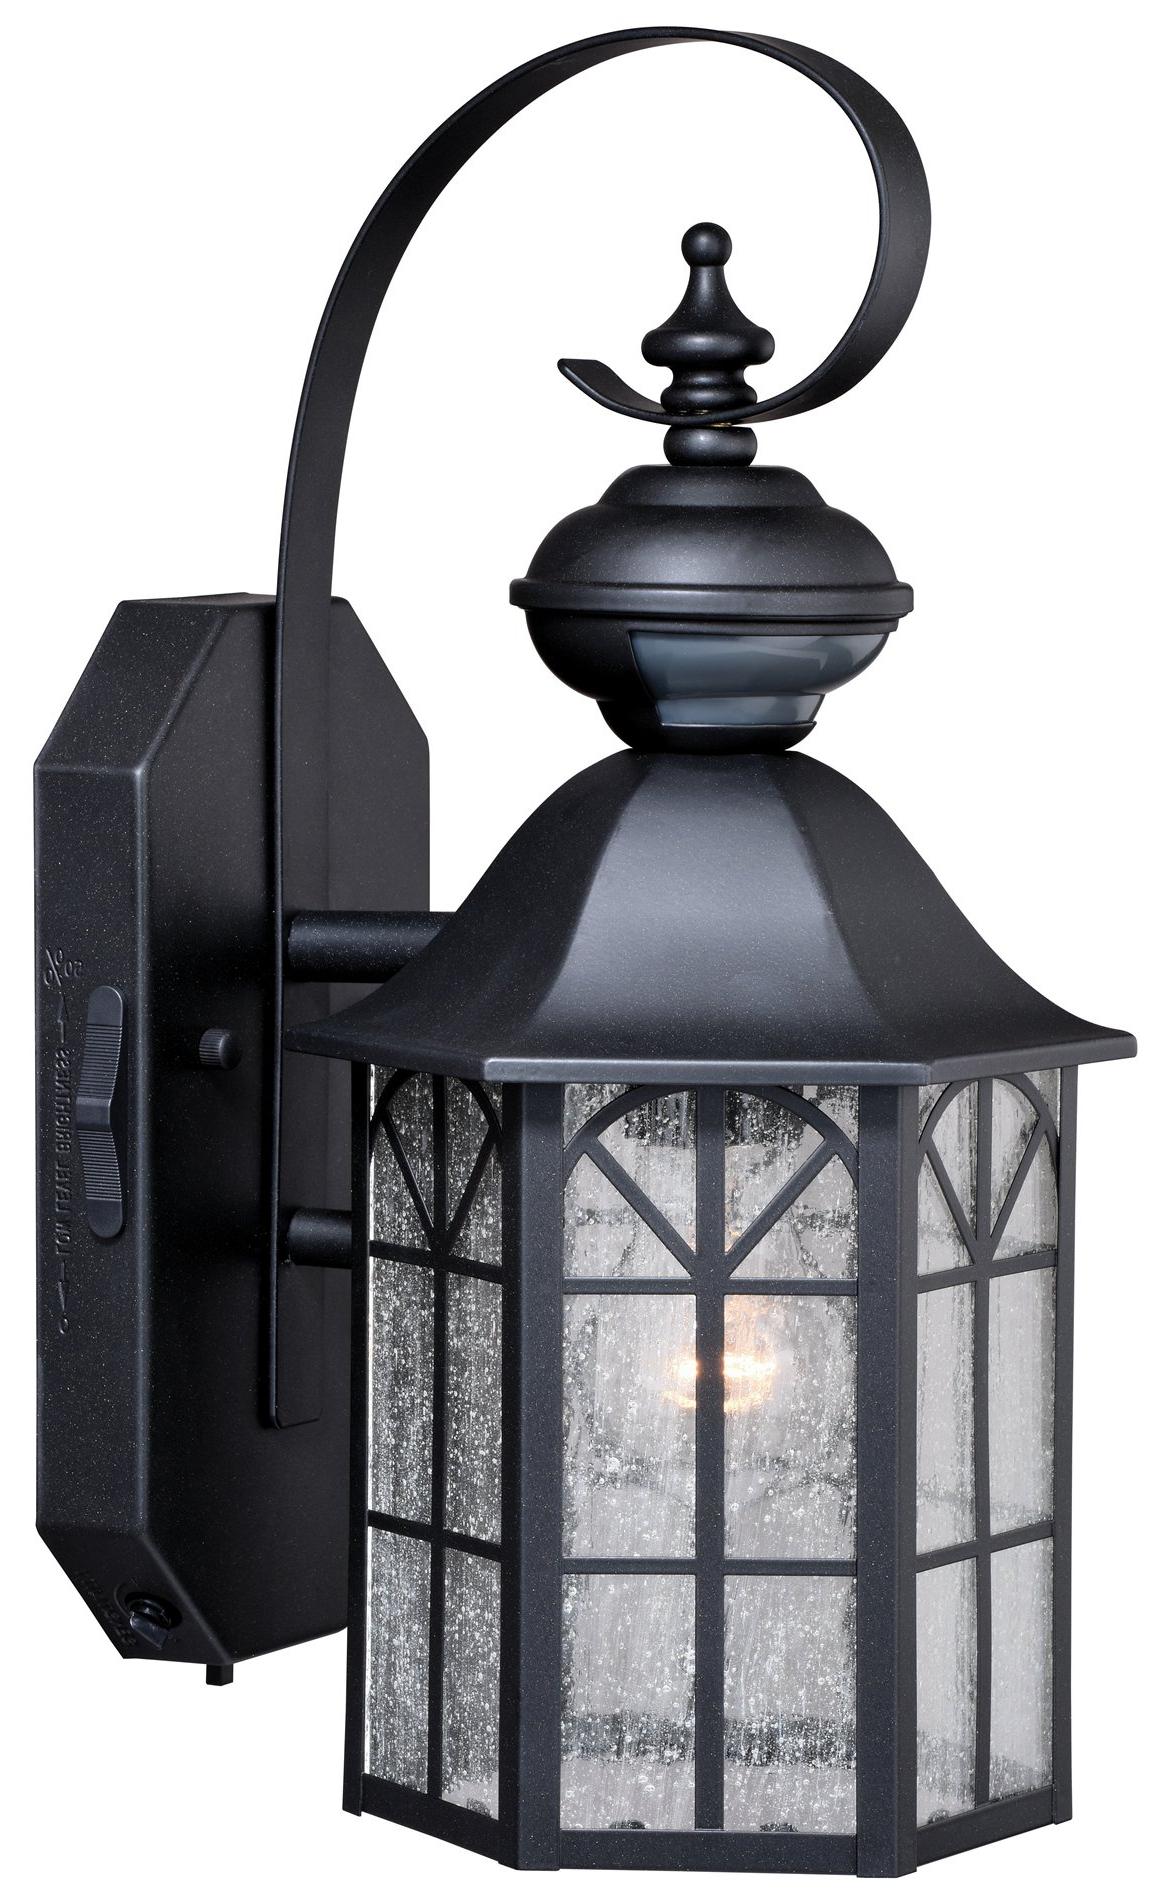 Trendy Tilley Olde Bronze Water Glass Outdoor Wall Lanterns Pertaining To Tudor Style Outdoor Light Fixtures – Outdoor Lighting Ideas (View 13 of 20)